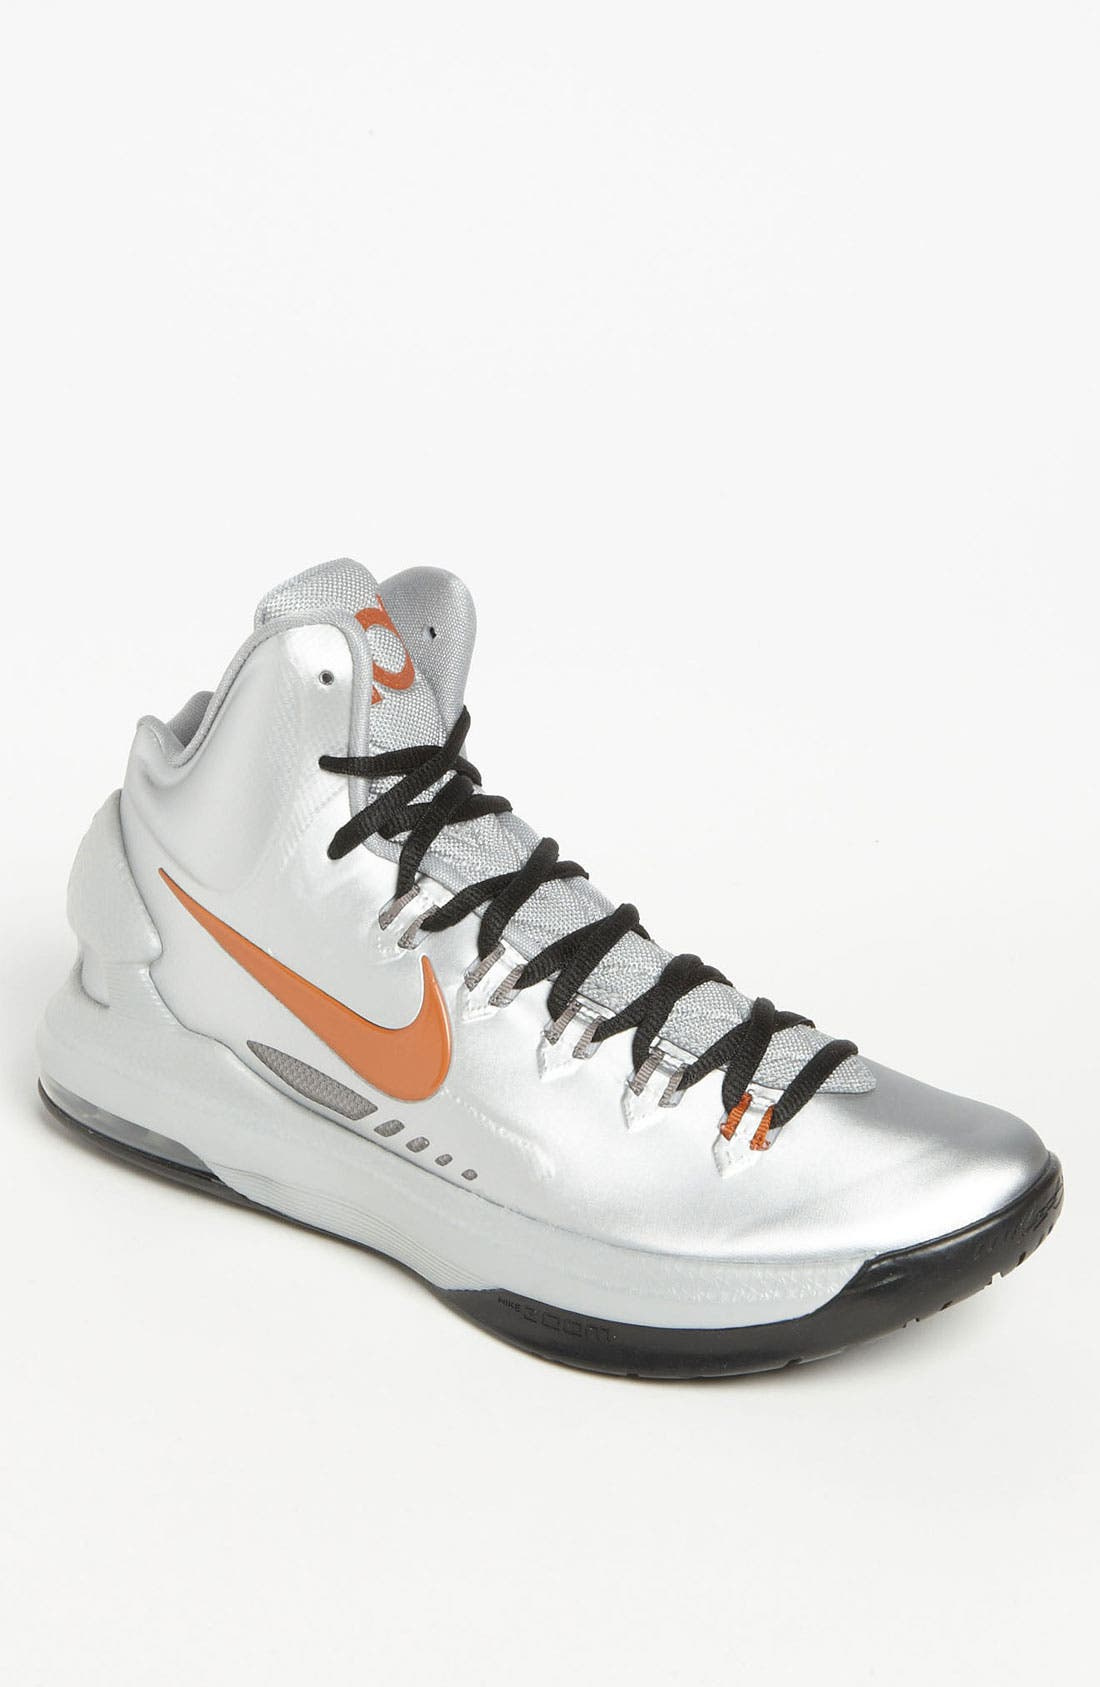 Main Image - Nike 'KD V' Basketball Shoe (Men)